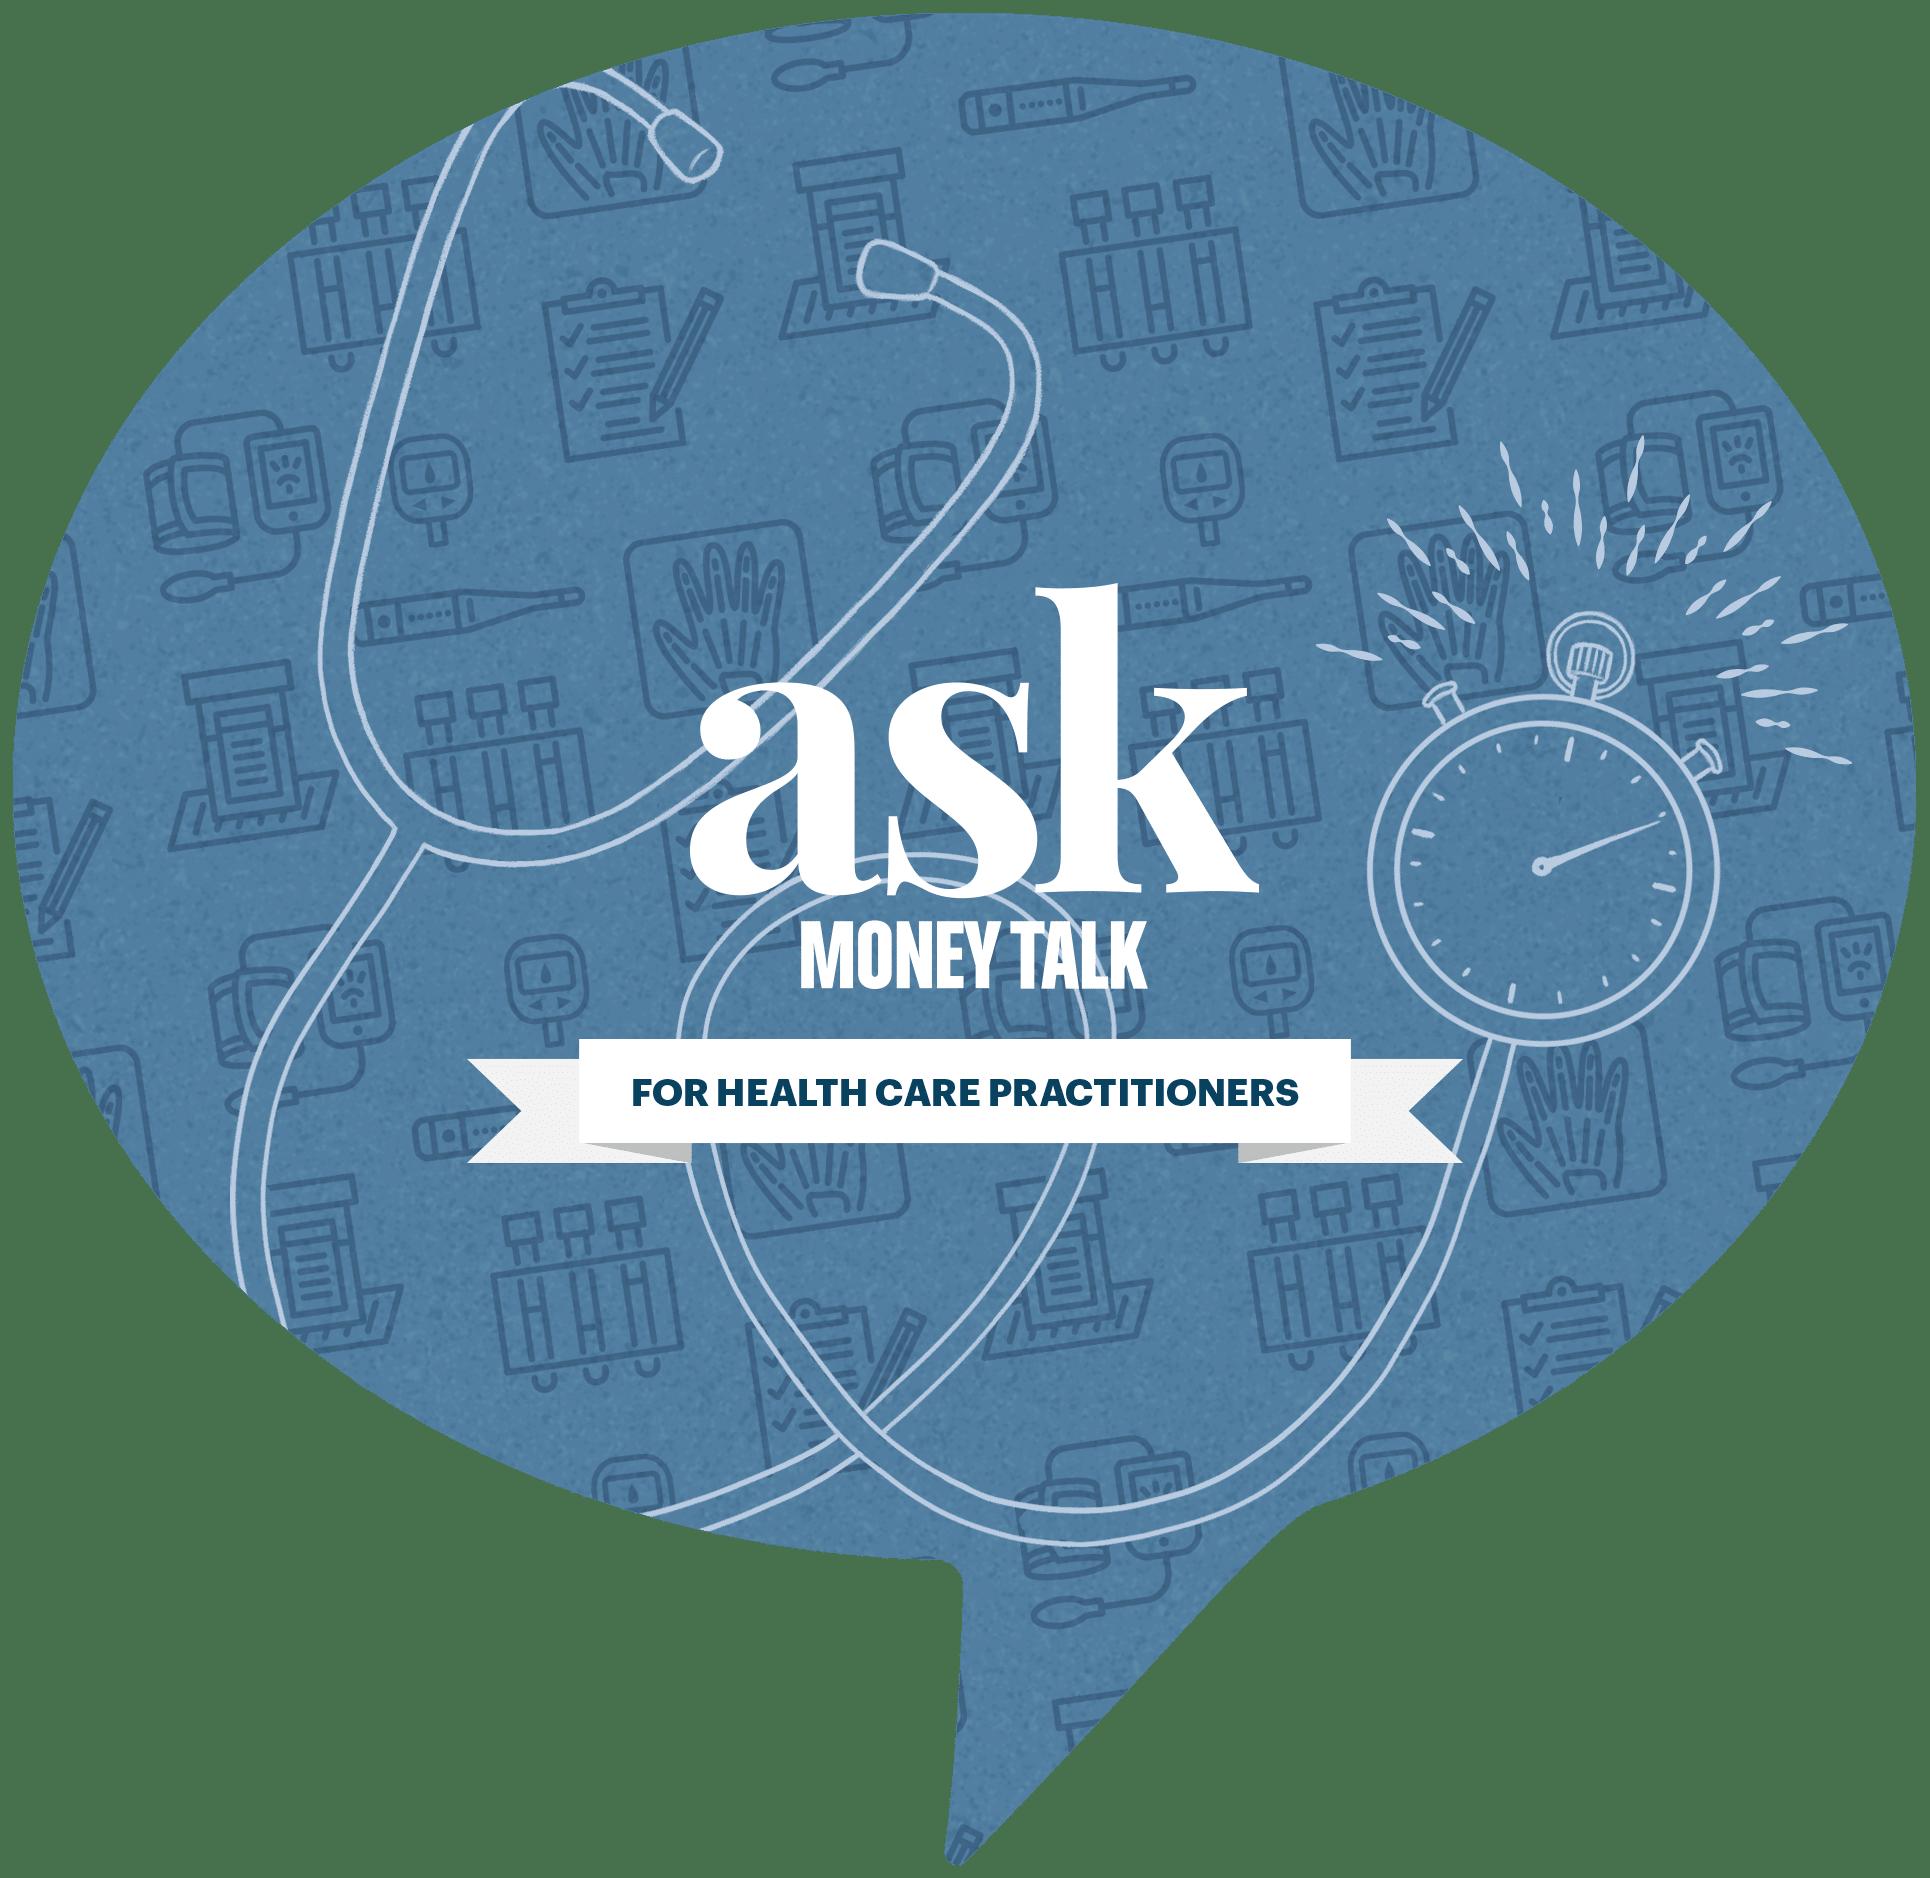 askmoneytalk logo for doctor opportunity cost